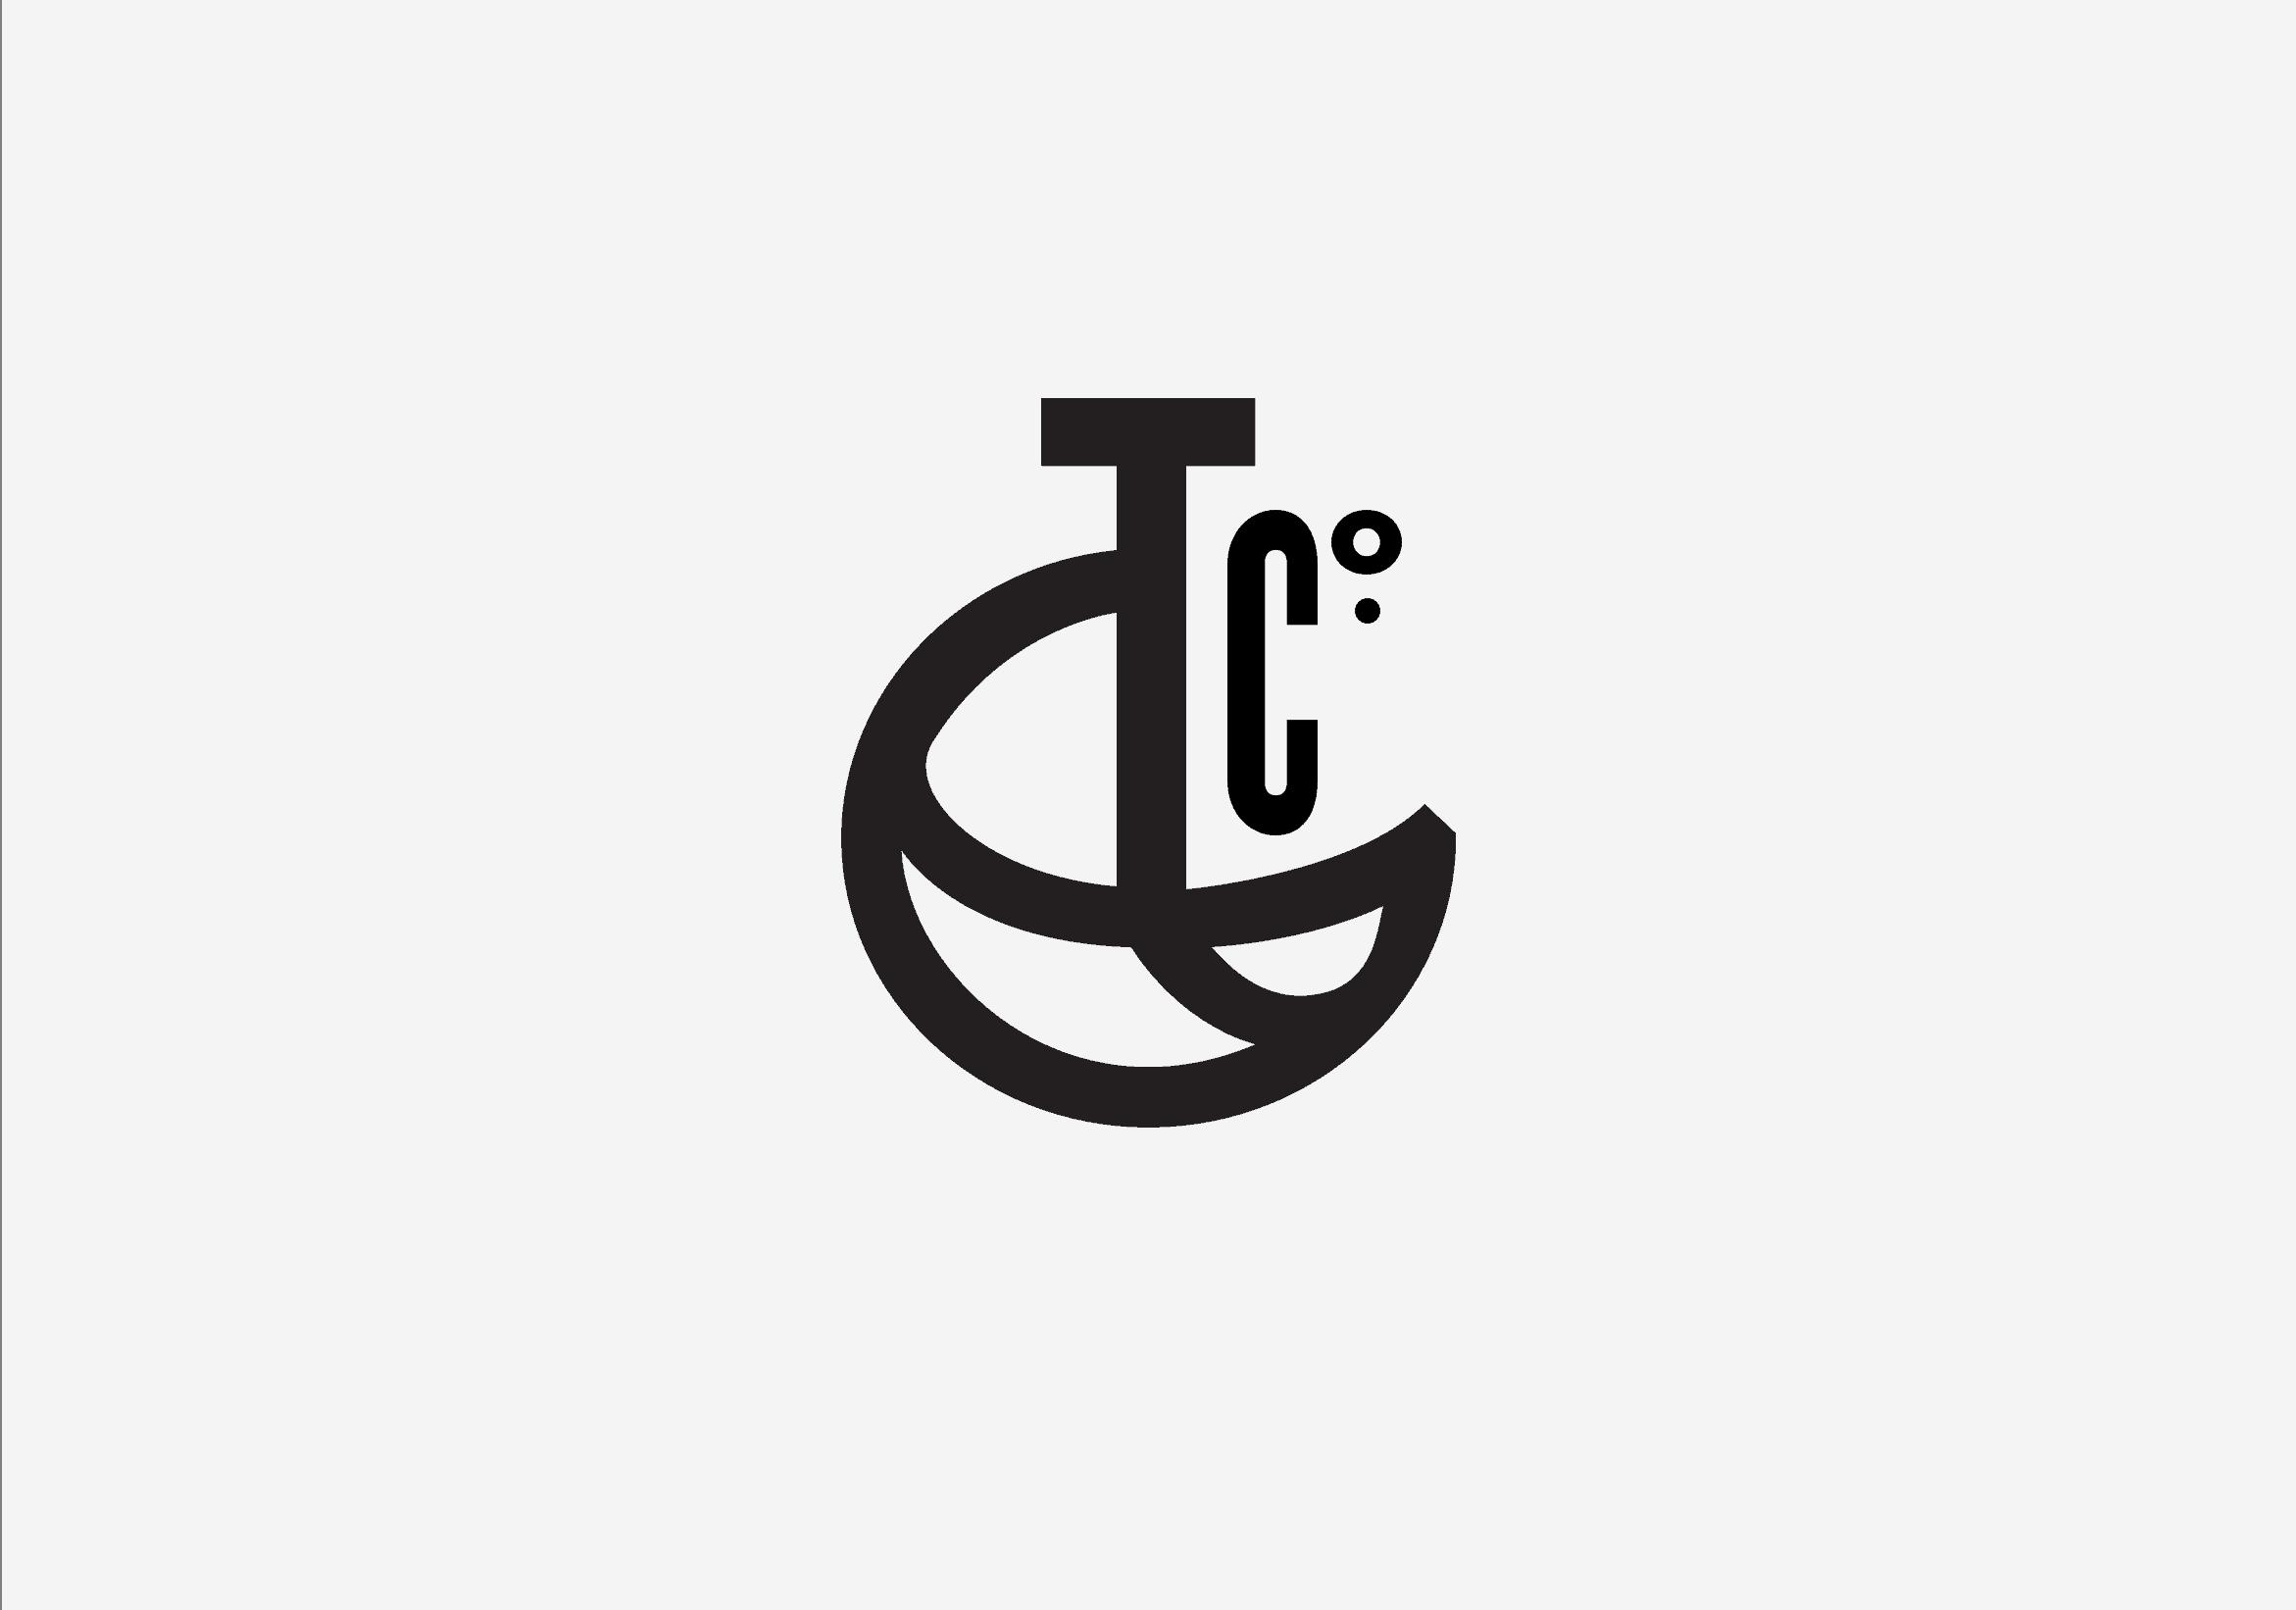 logos-tailwag-mark